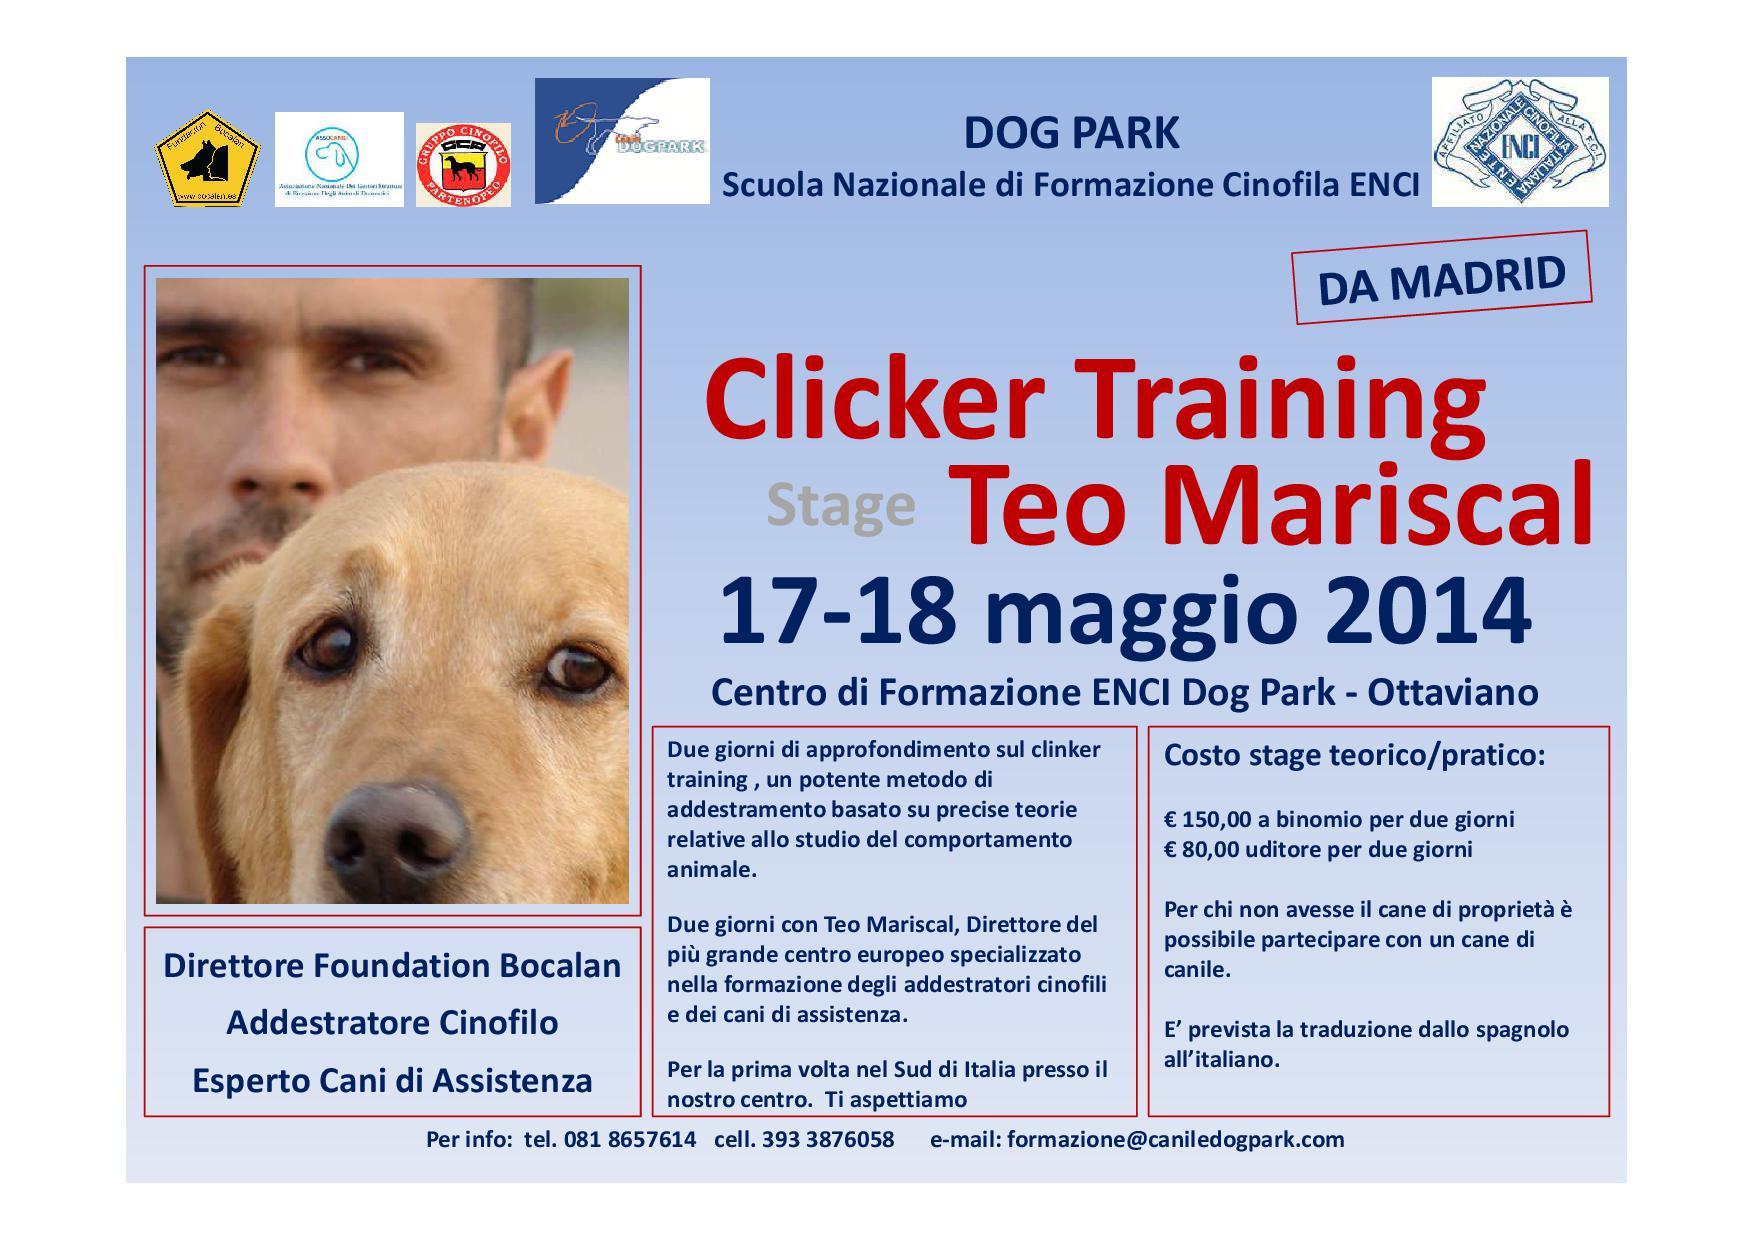 Clicker Training-Teo Mariscal